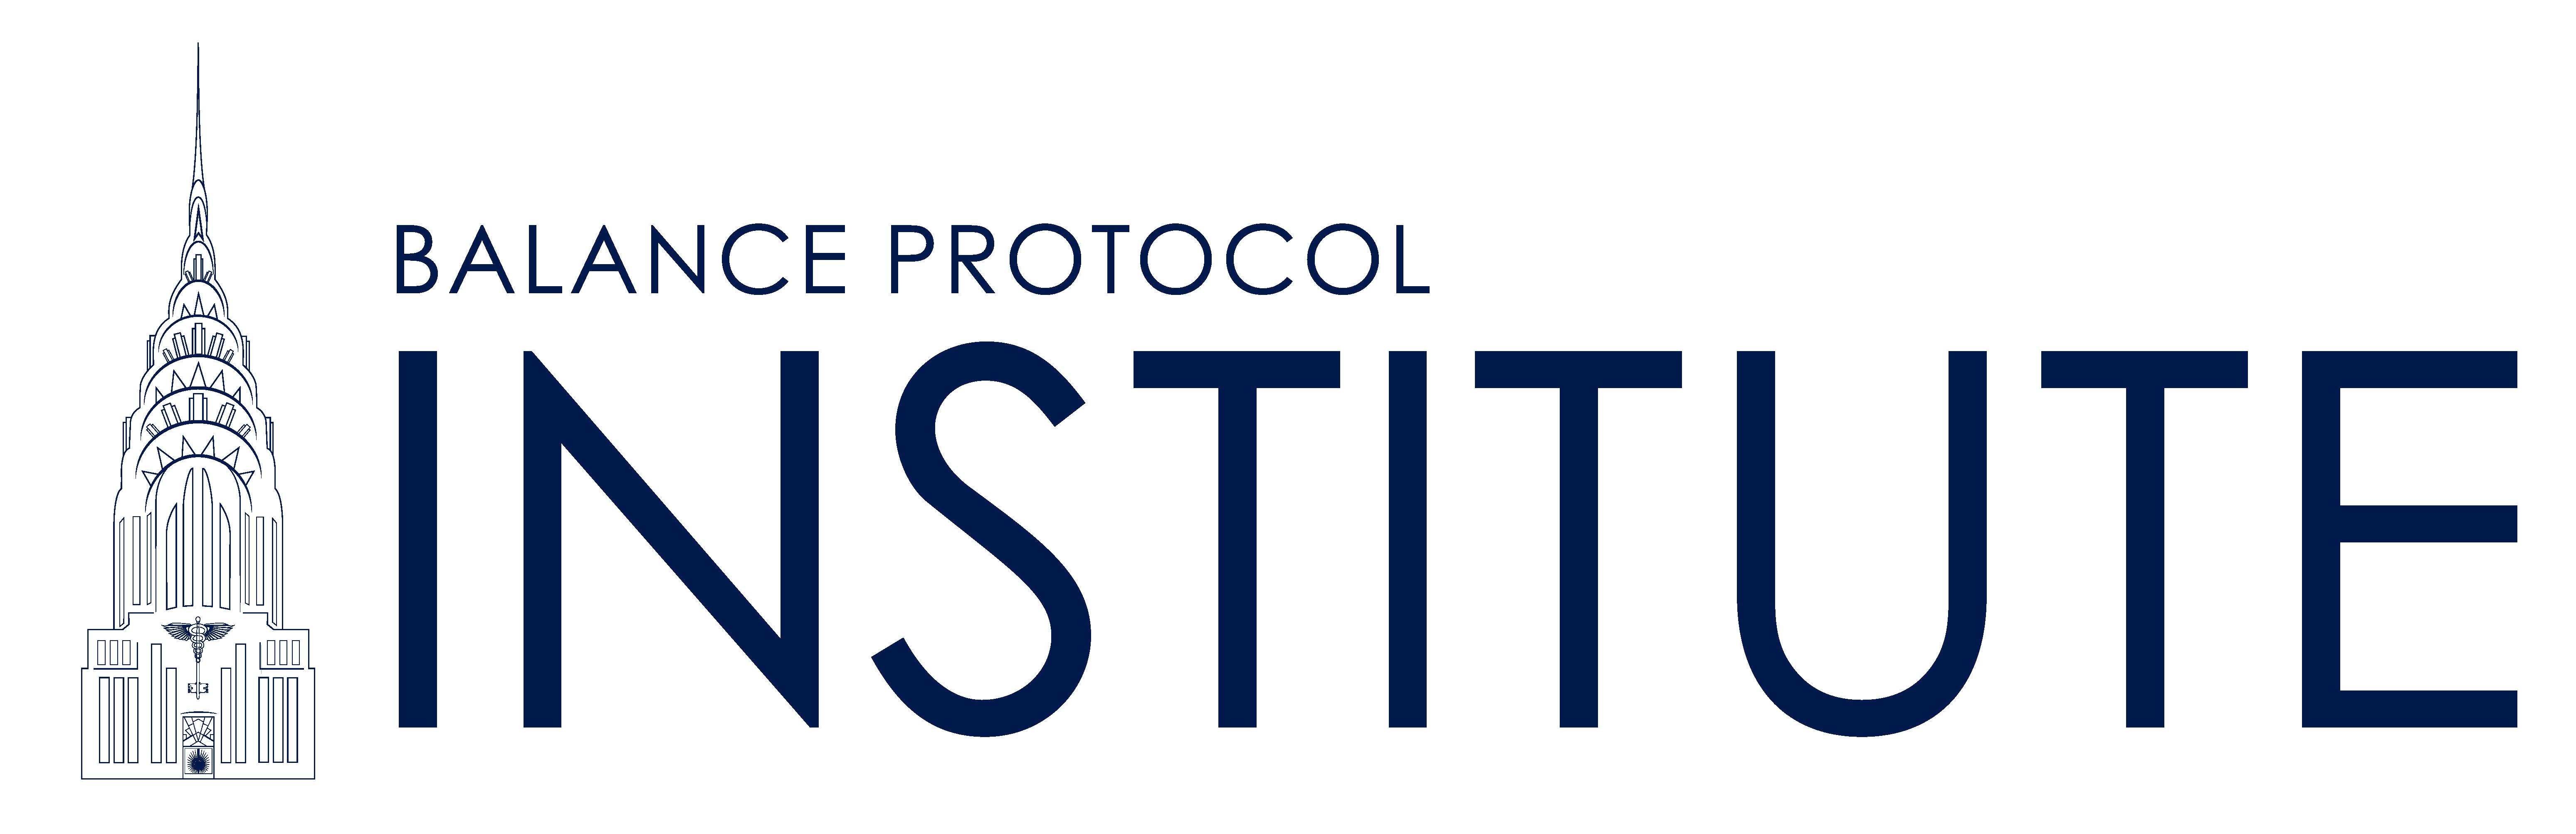 Balance Protocol Institute